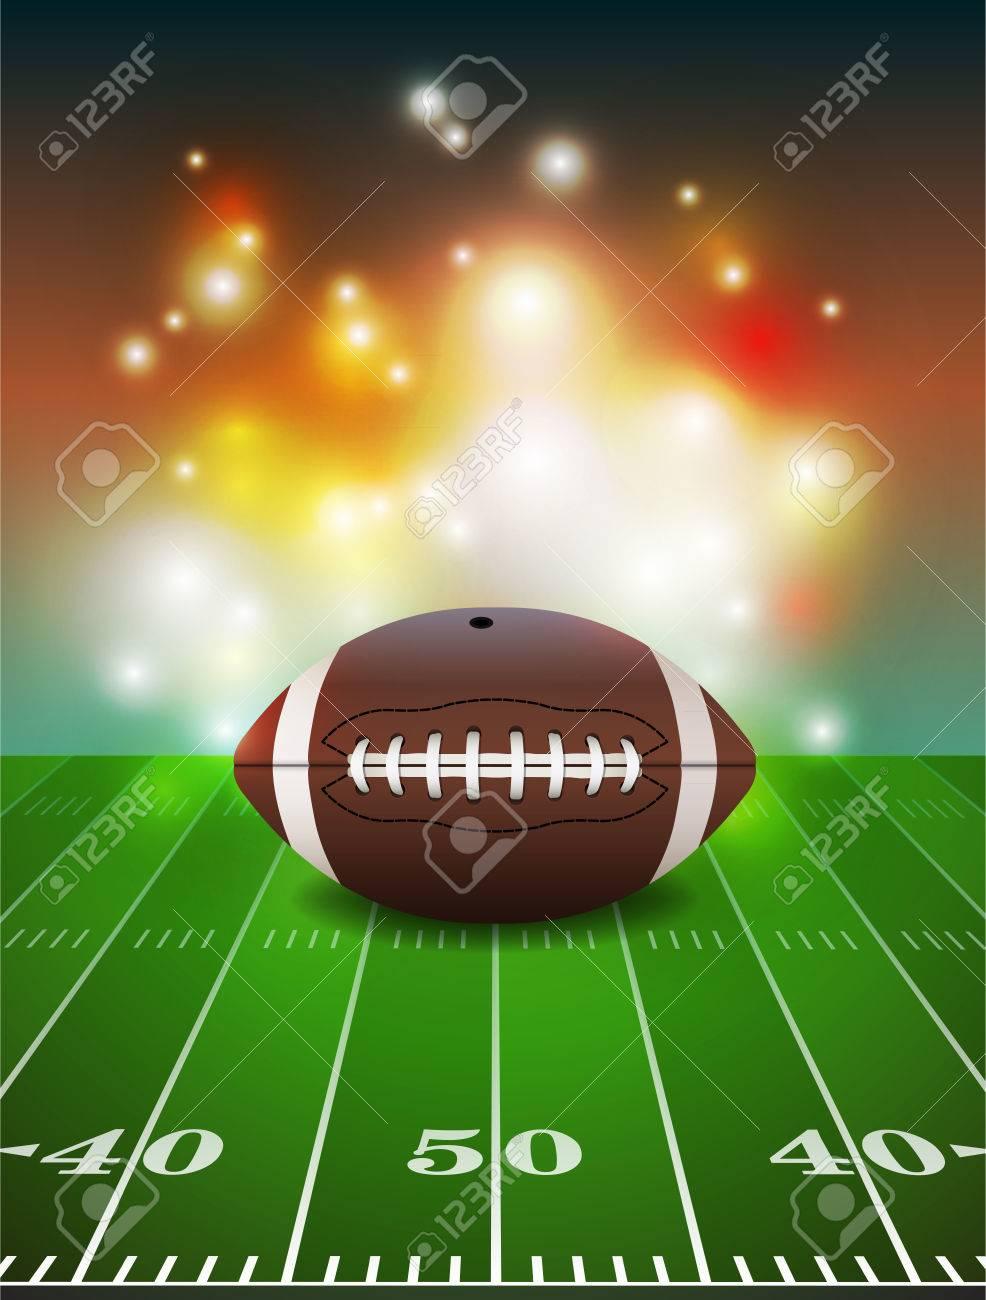 American football on grass turf field illustration. - 51394599